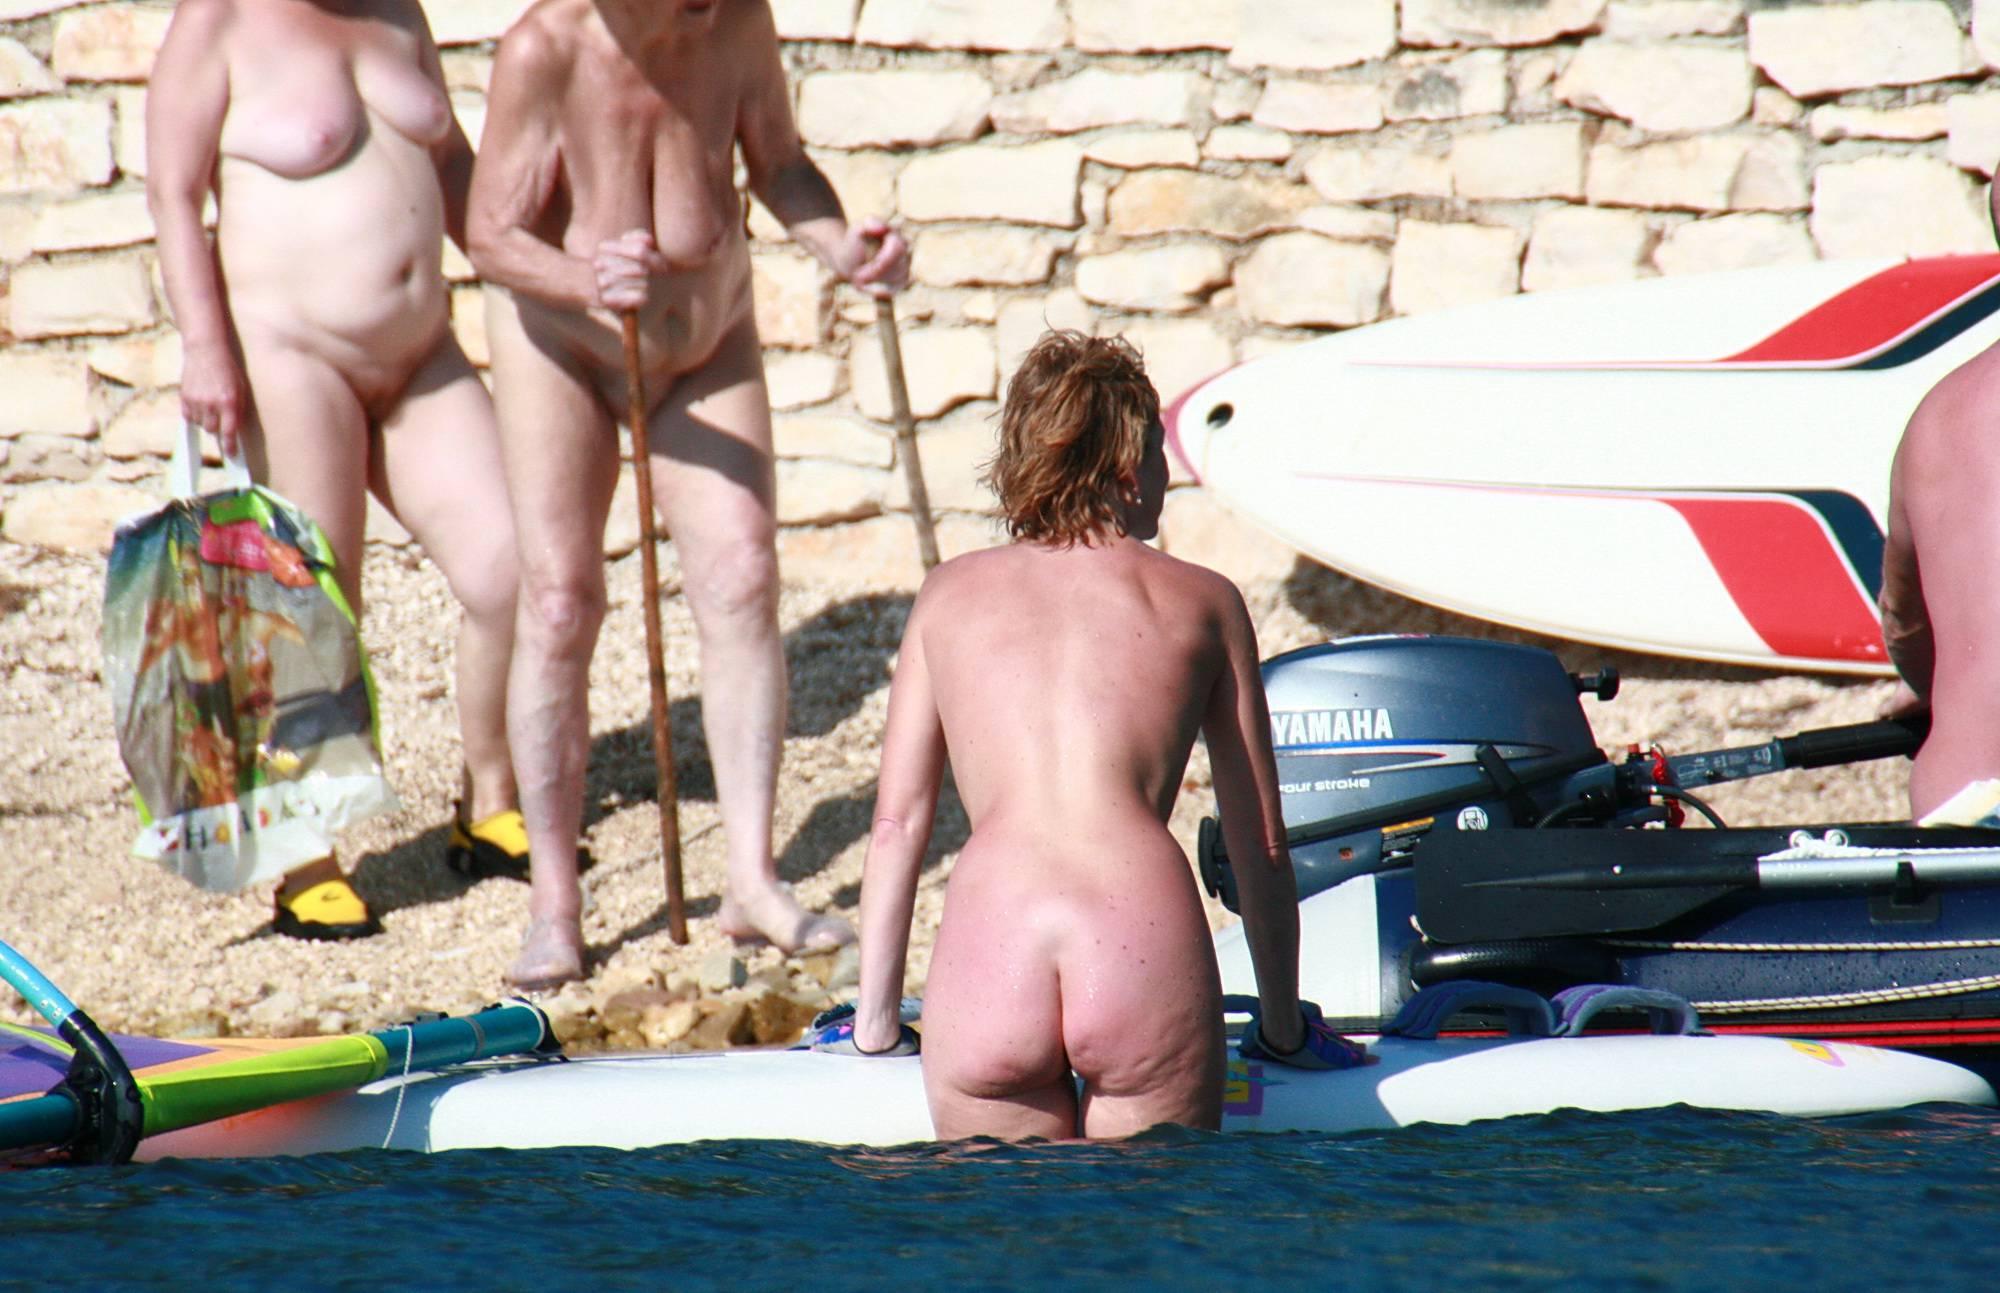 Nudist Gallery Wind Surfing Afternoon - 1